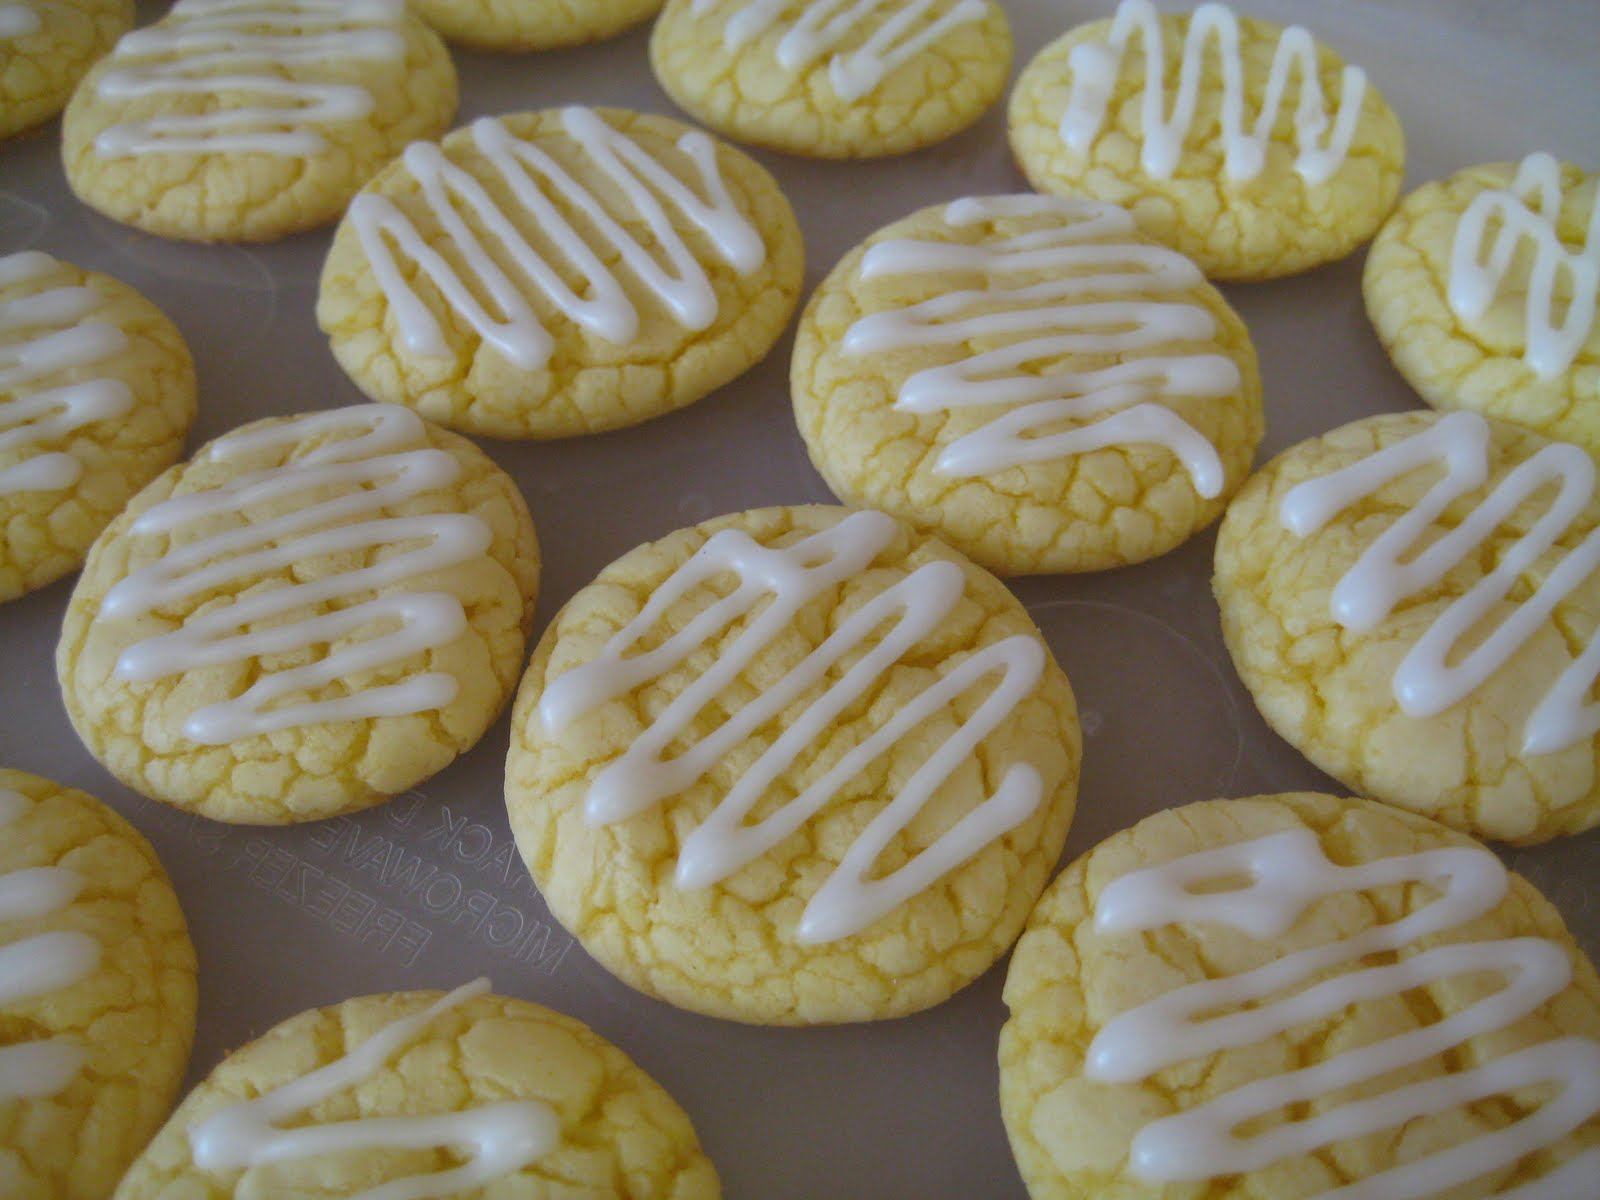 Treats By Christi: Lemon Cookies